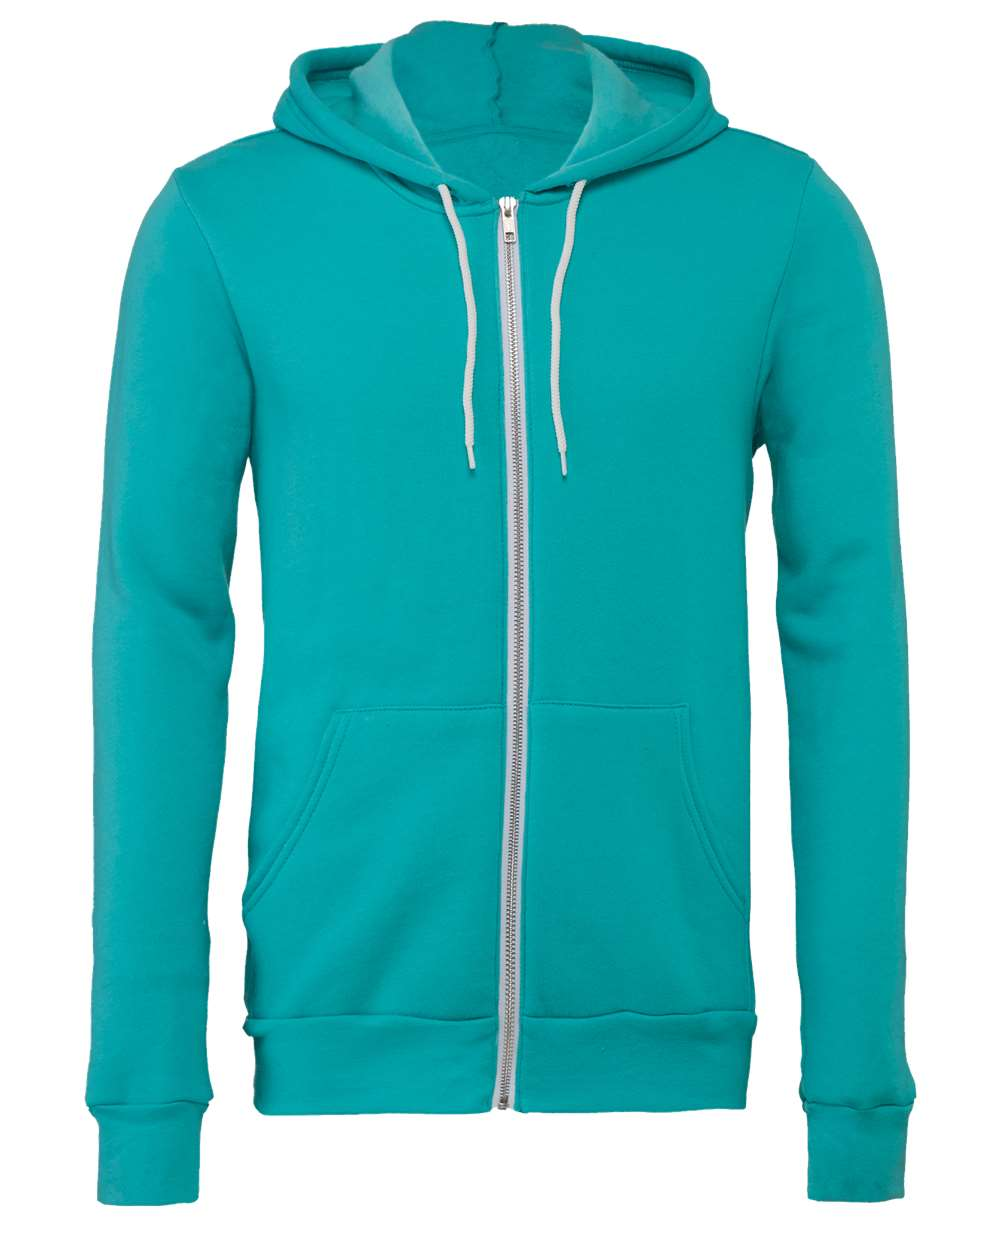 Bella-Canvas-Unisex-Full-Zip-Up-Hooded-Sweatshirt-Blank-Hoodie-3739-up-to-3XL thumbnail 85